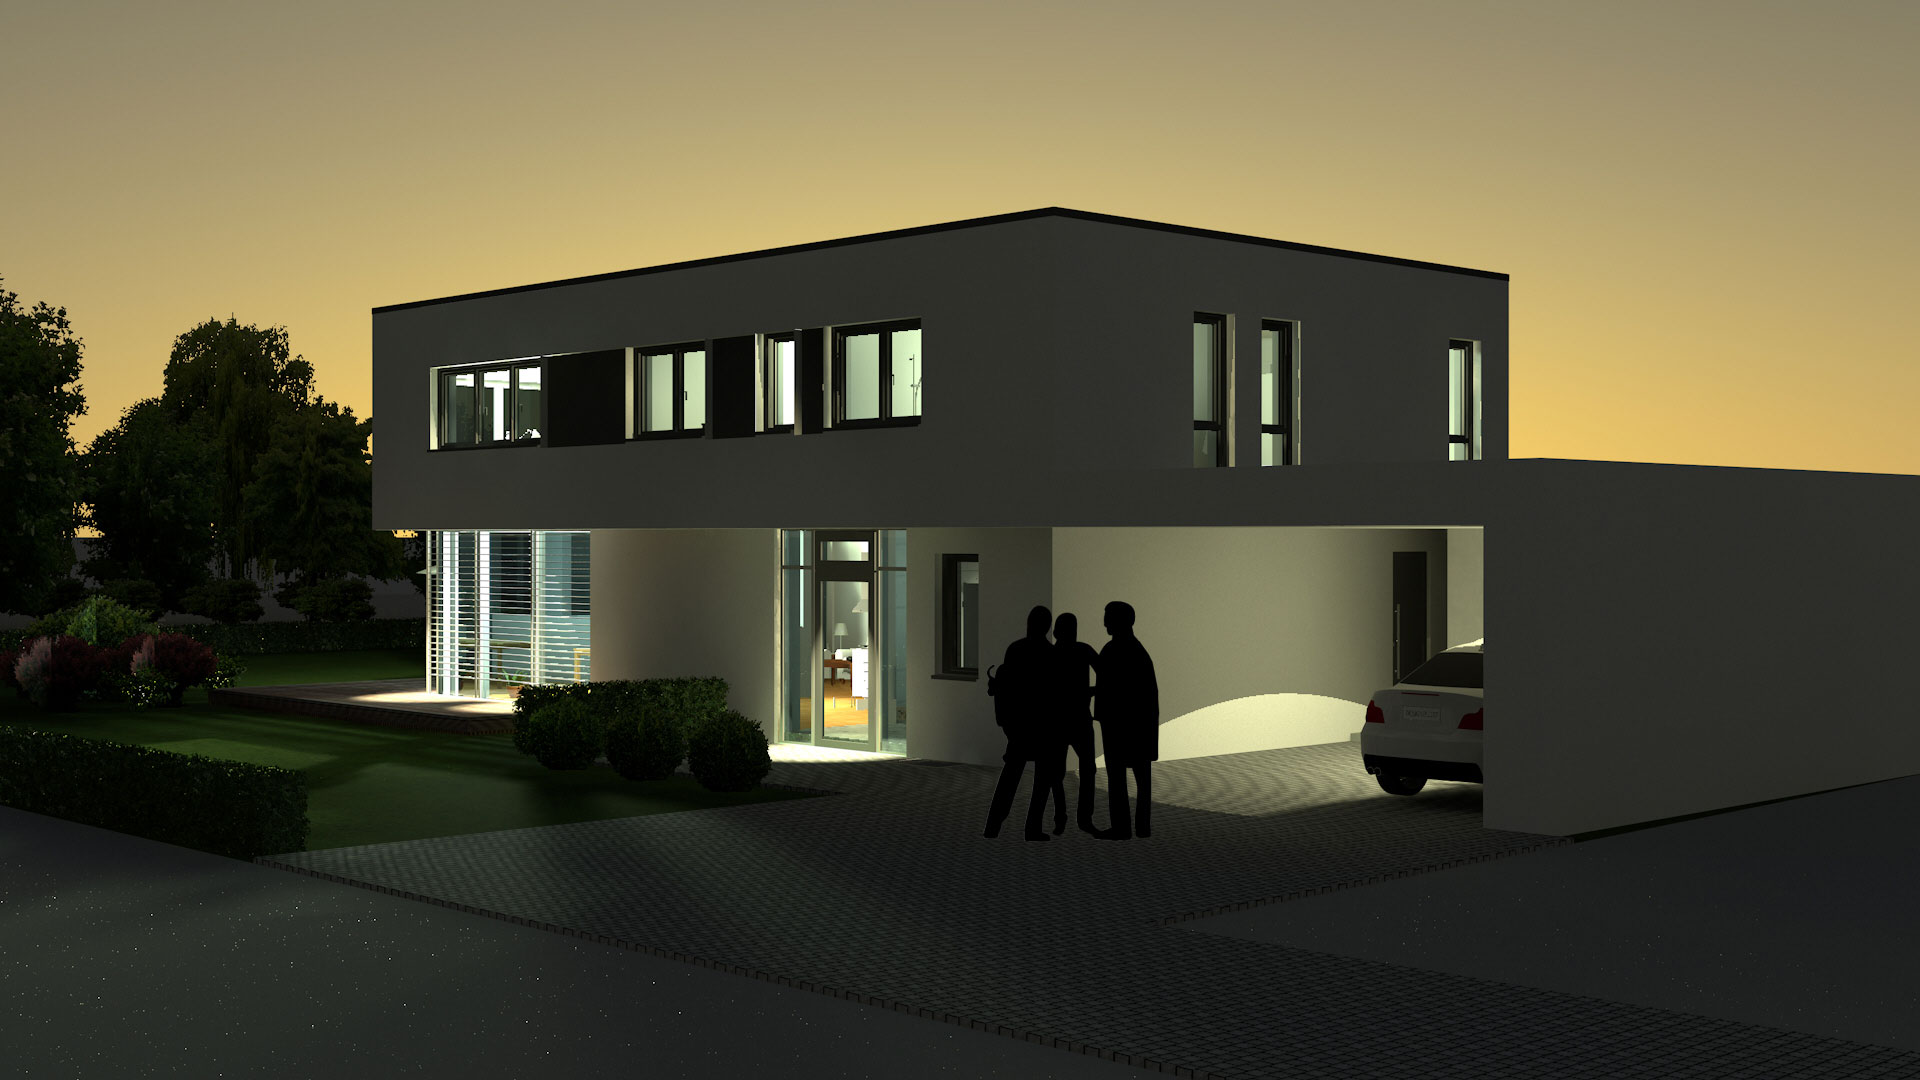 Neubau modernes flachdachhaus mit carport in wei enburg for Modernes haus mit carport